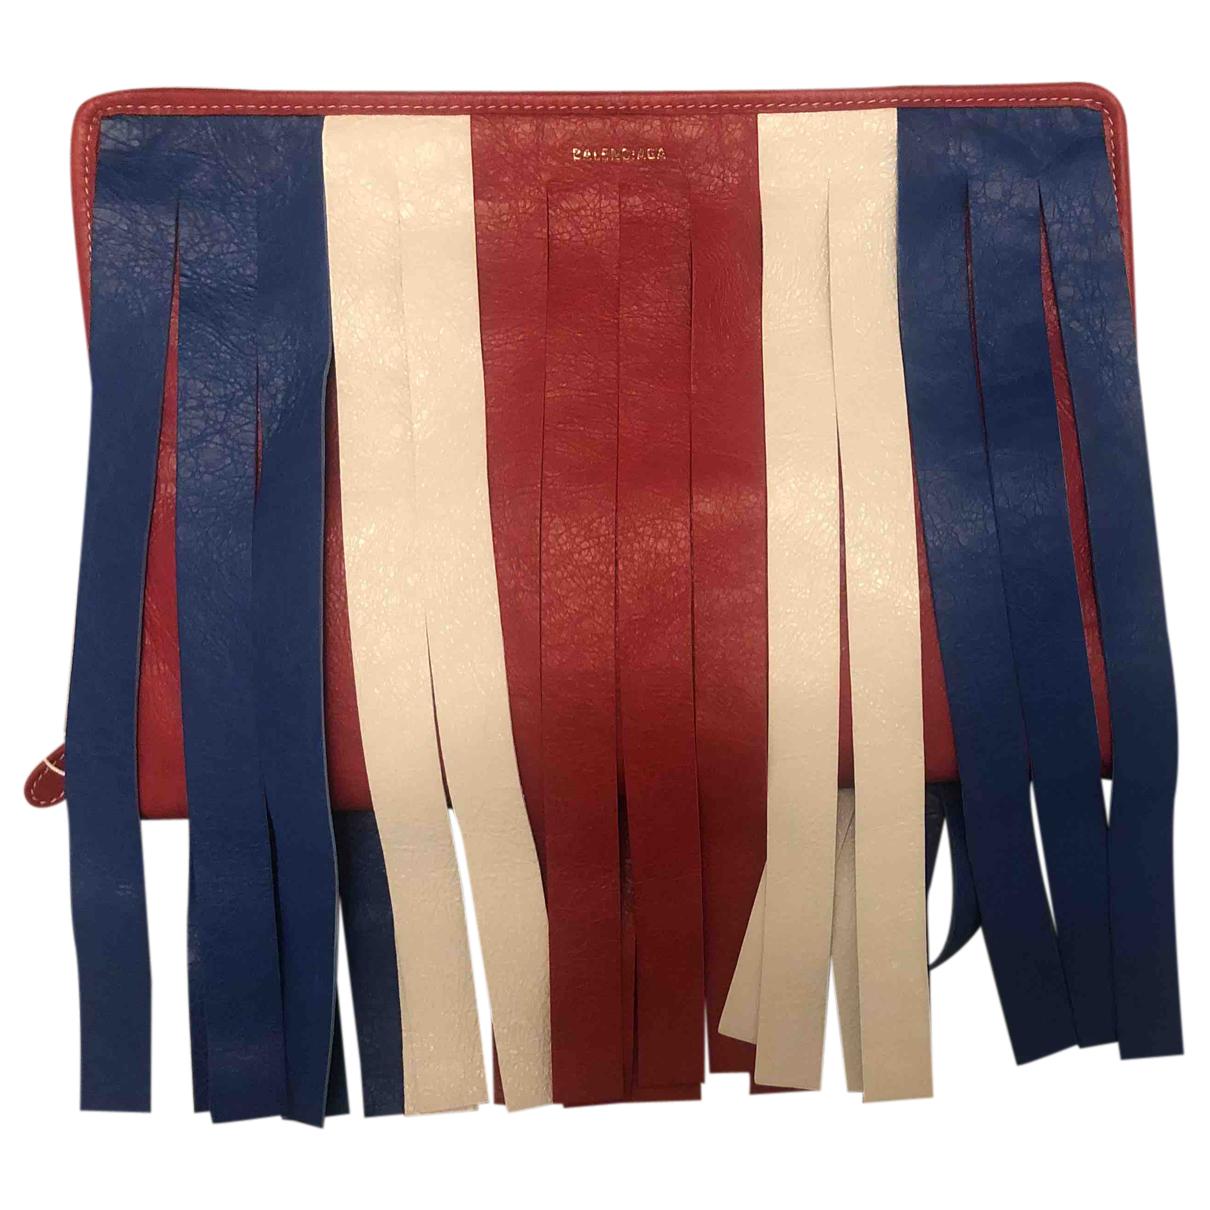 Balenciaga - Pochette Bazar Bag pour femme en cuir - multicolore